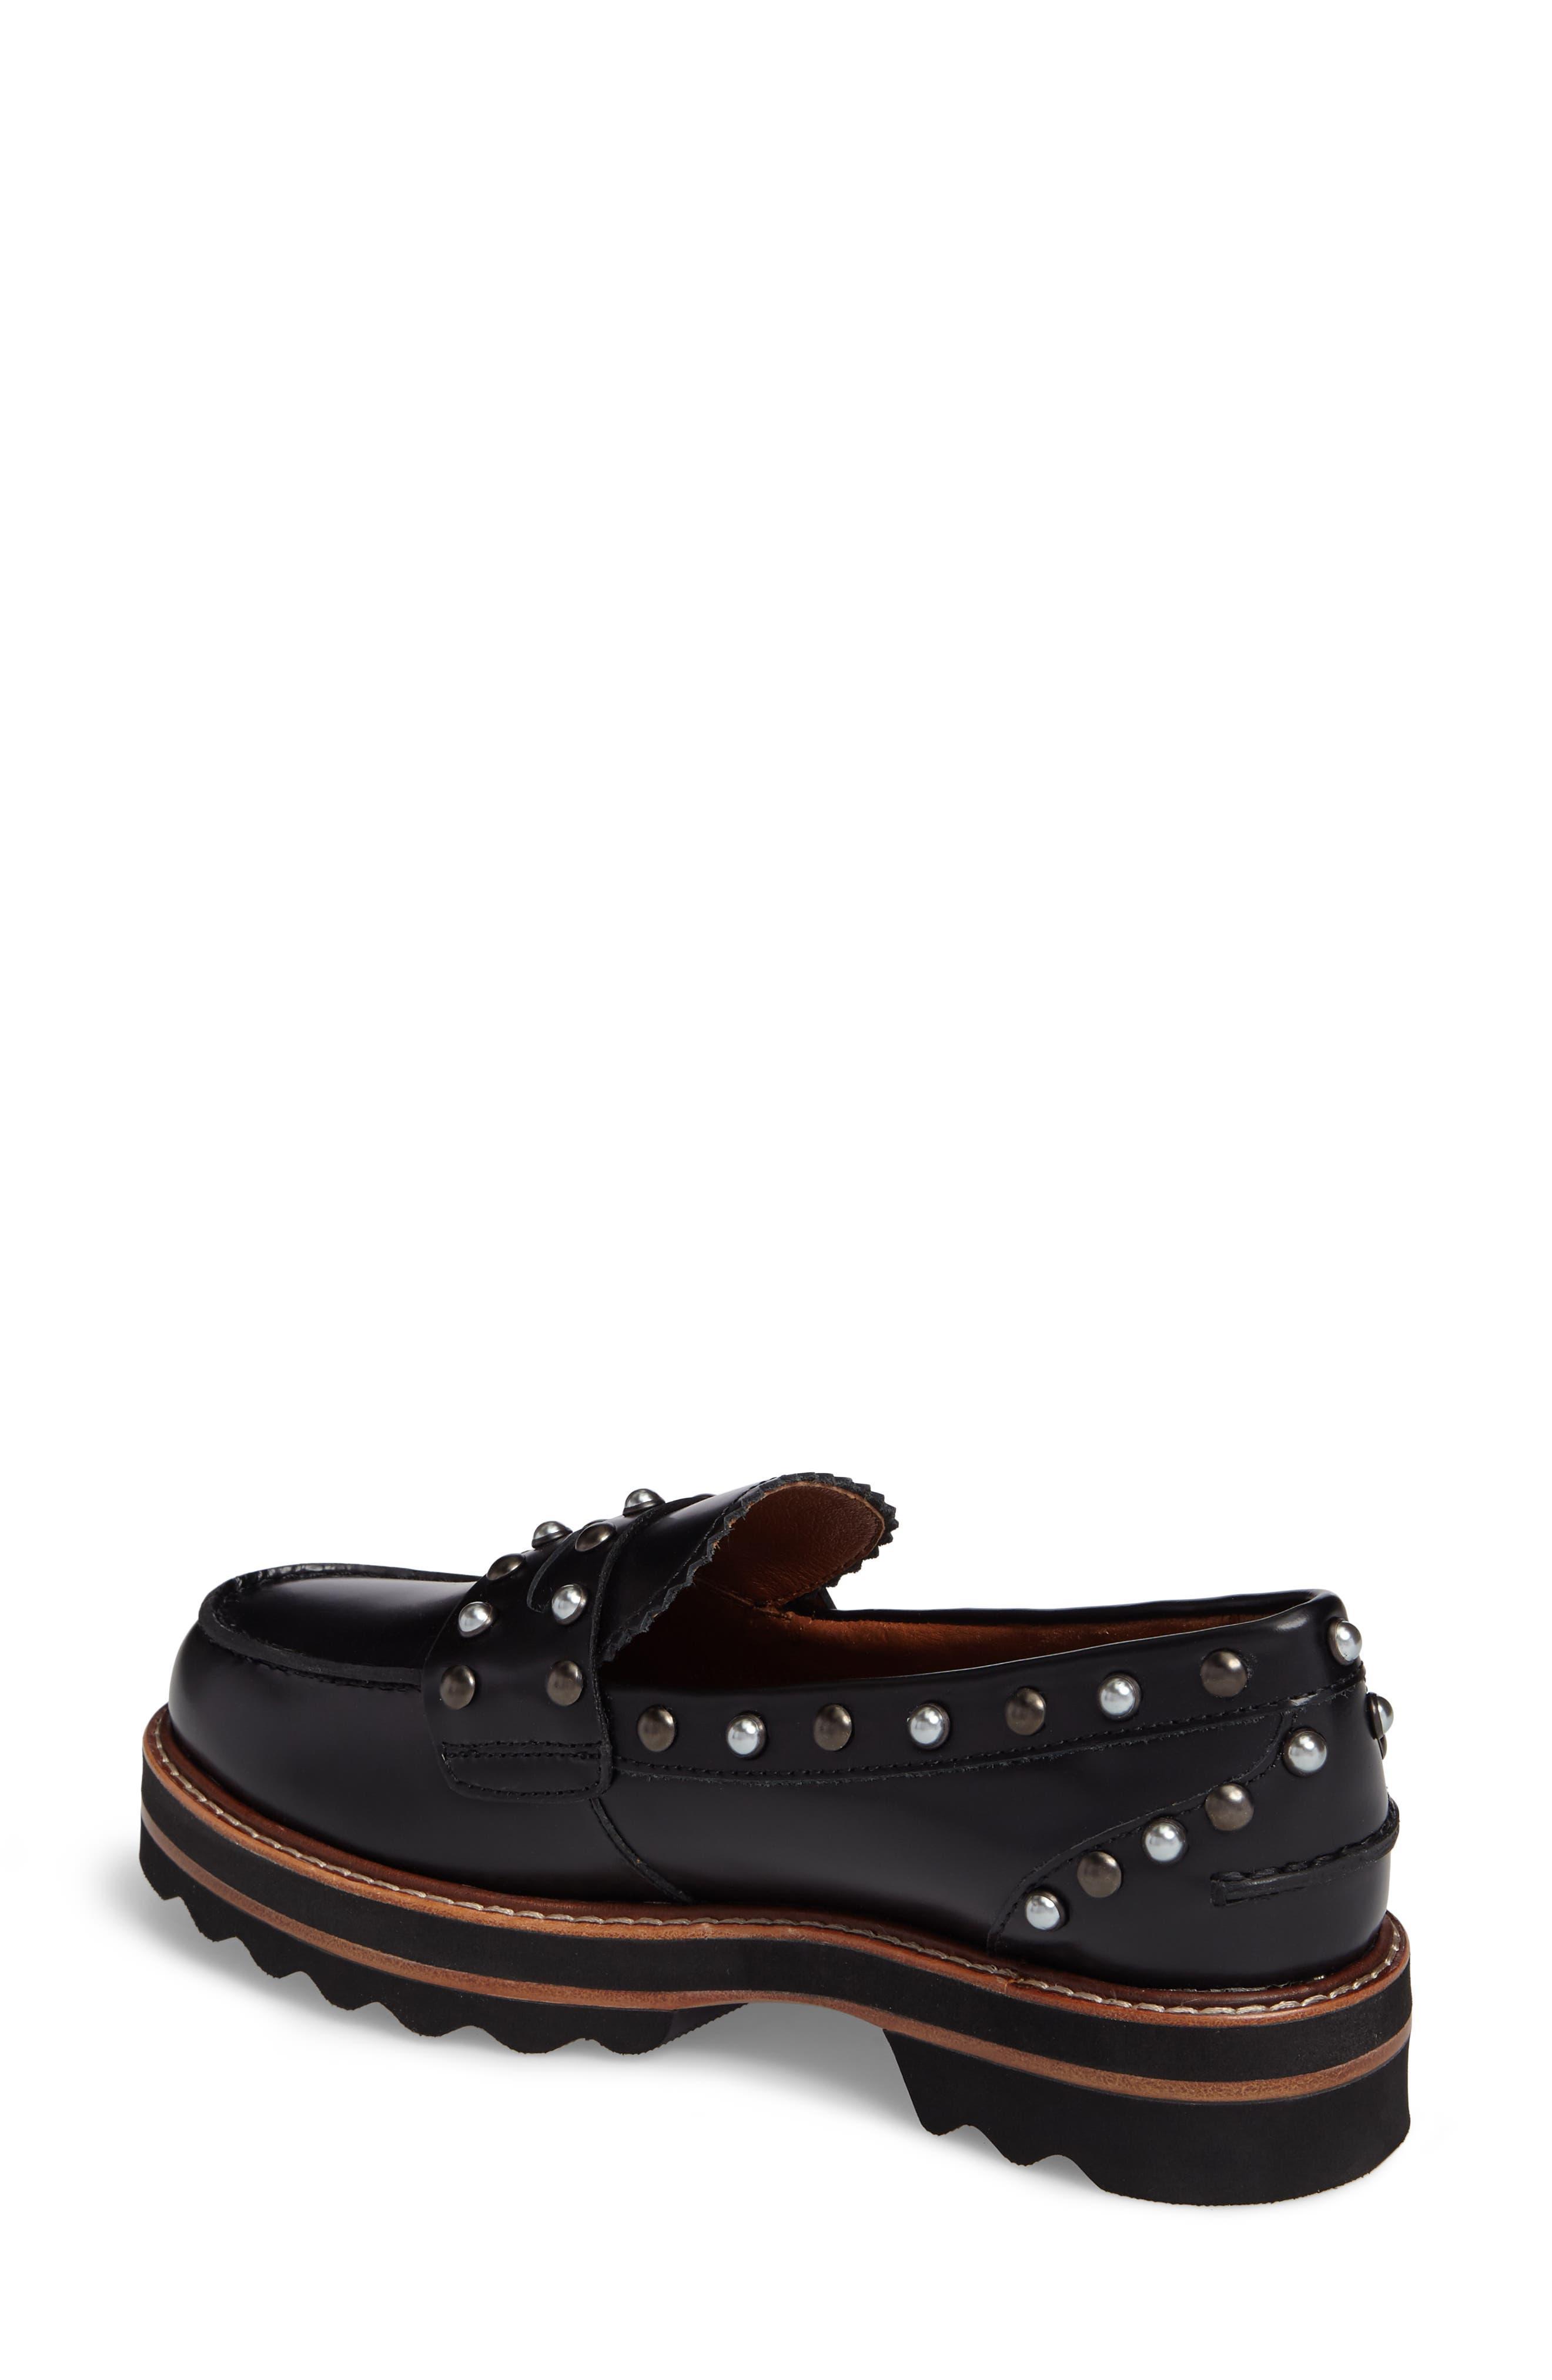 Lenox Loafer,                             Alternate thumbnail 2, color,                             Black Leather